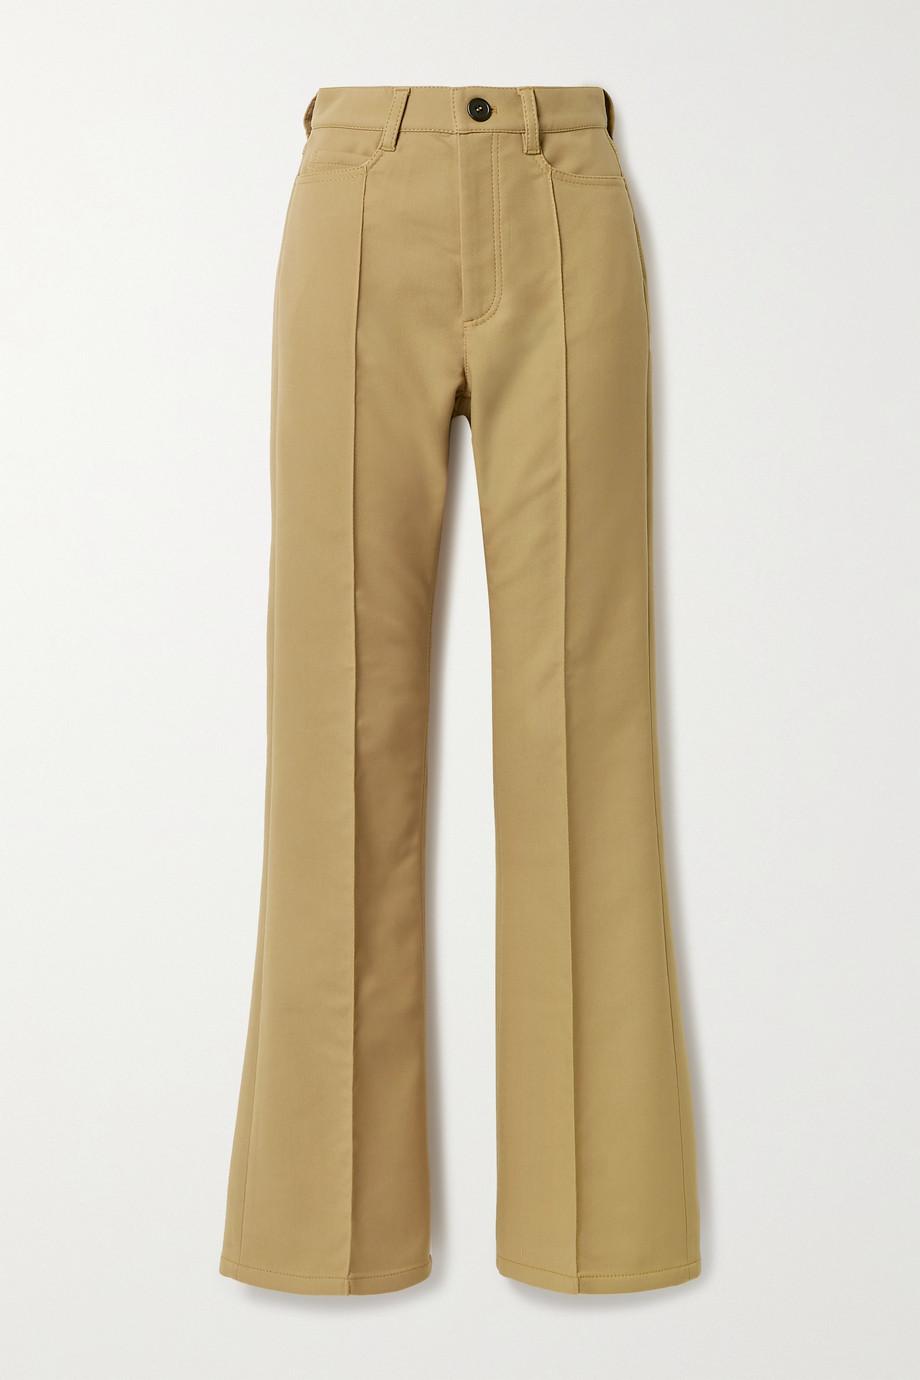 Meryll Rogge Twill flared pants